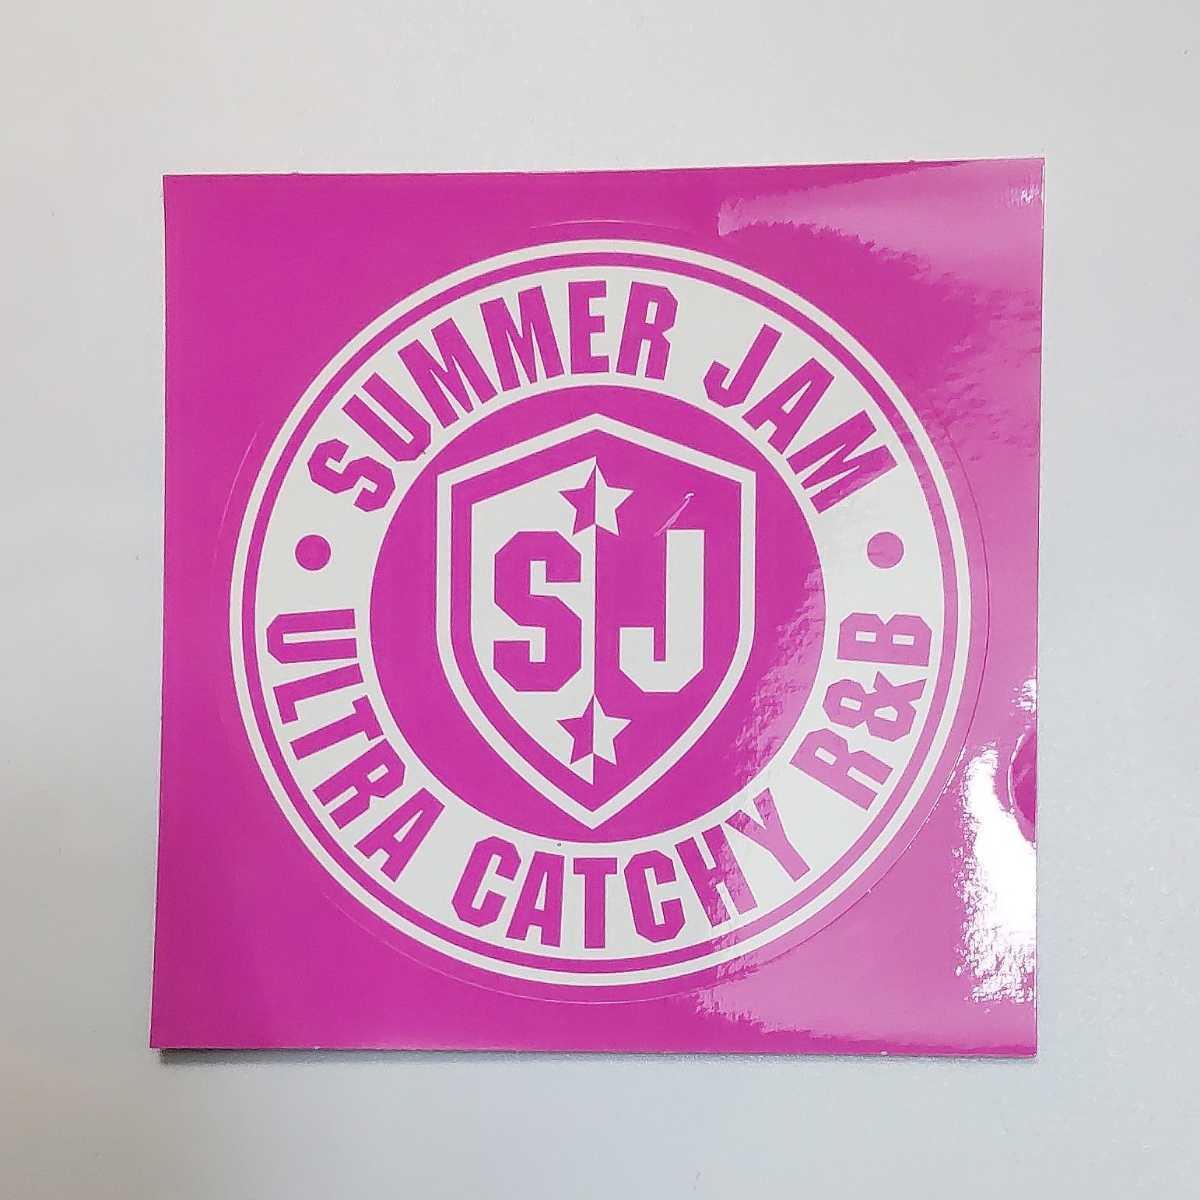 SUMMER JAM ULTLA CATCHY R&B サマージャム ステッカー★検)ノベルティー シール 非売品 販促品 デッドストック 当時物 サマジャム_画像1